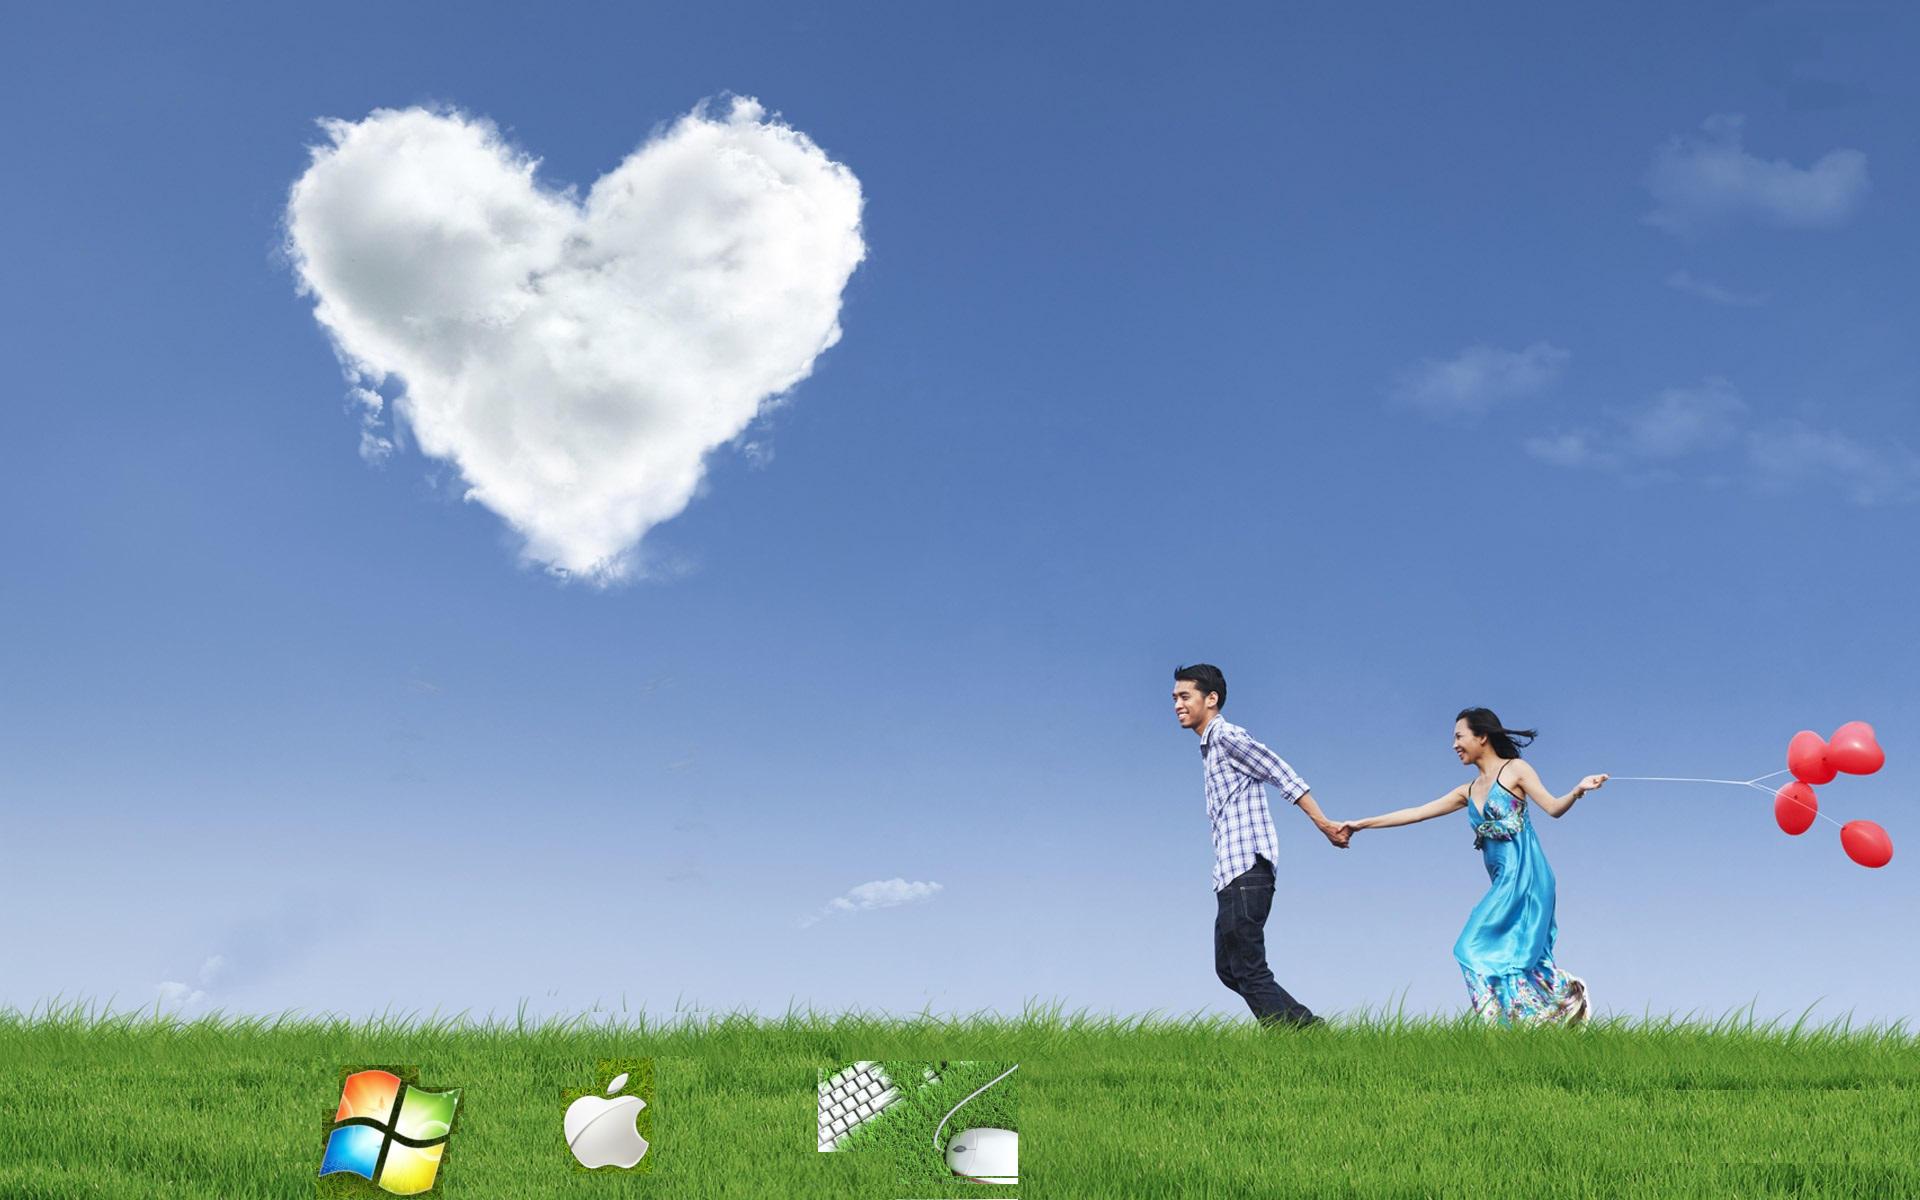 Love, Relationships & Technology